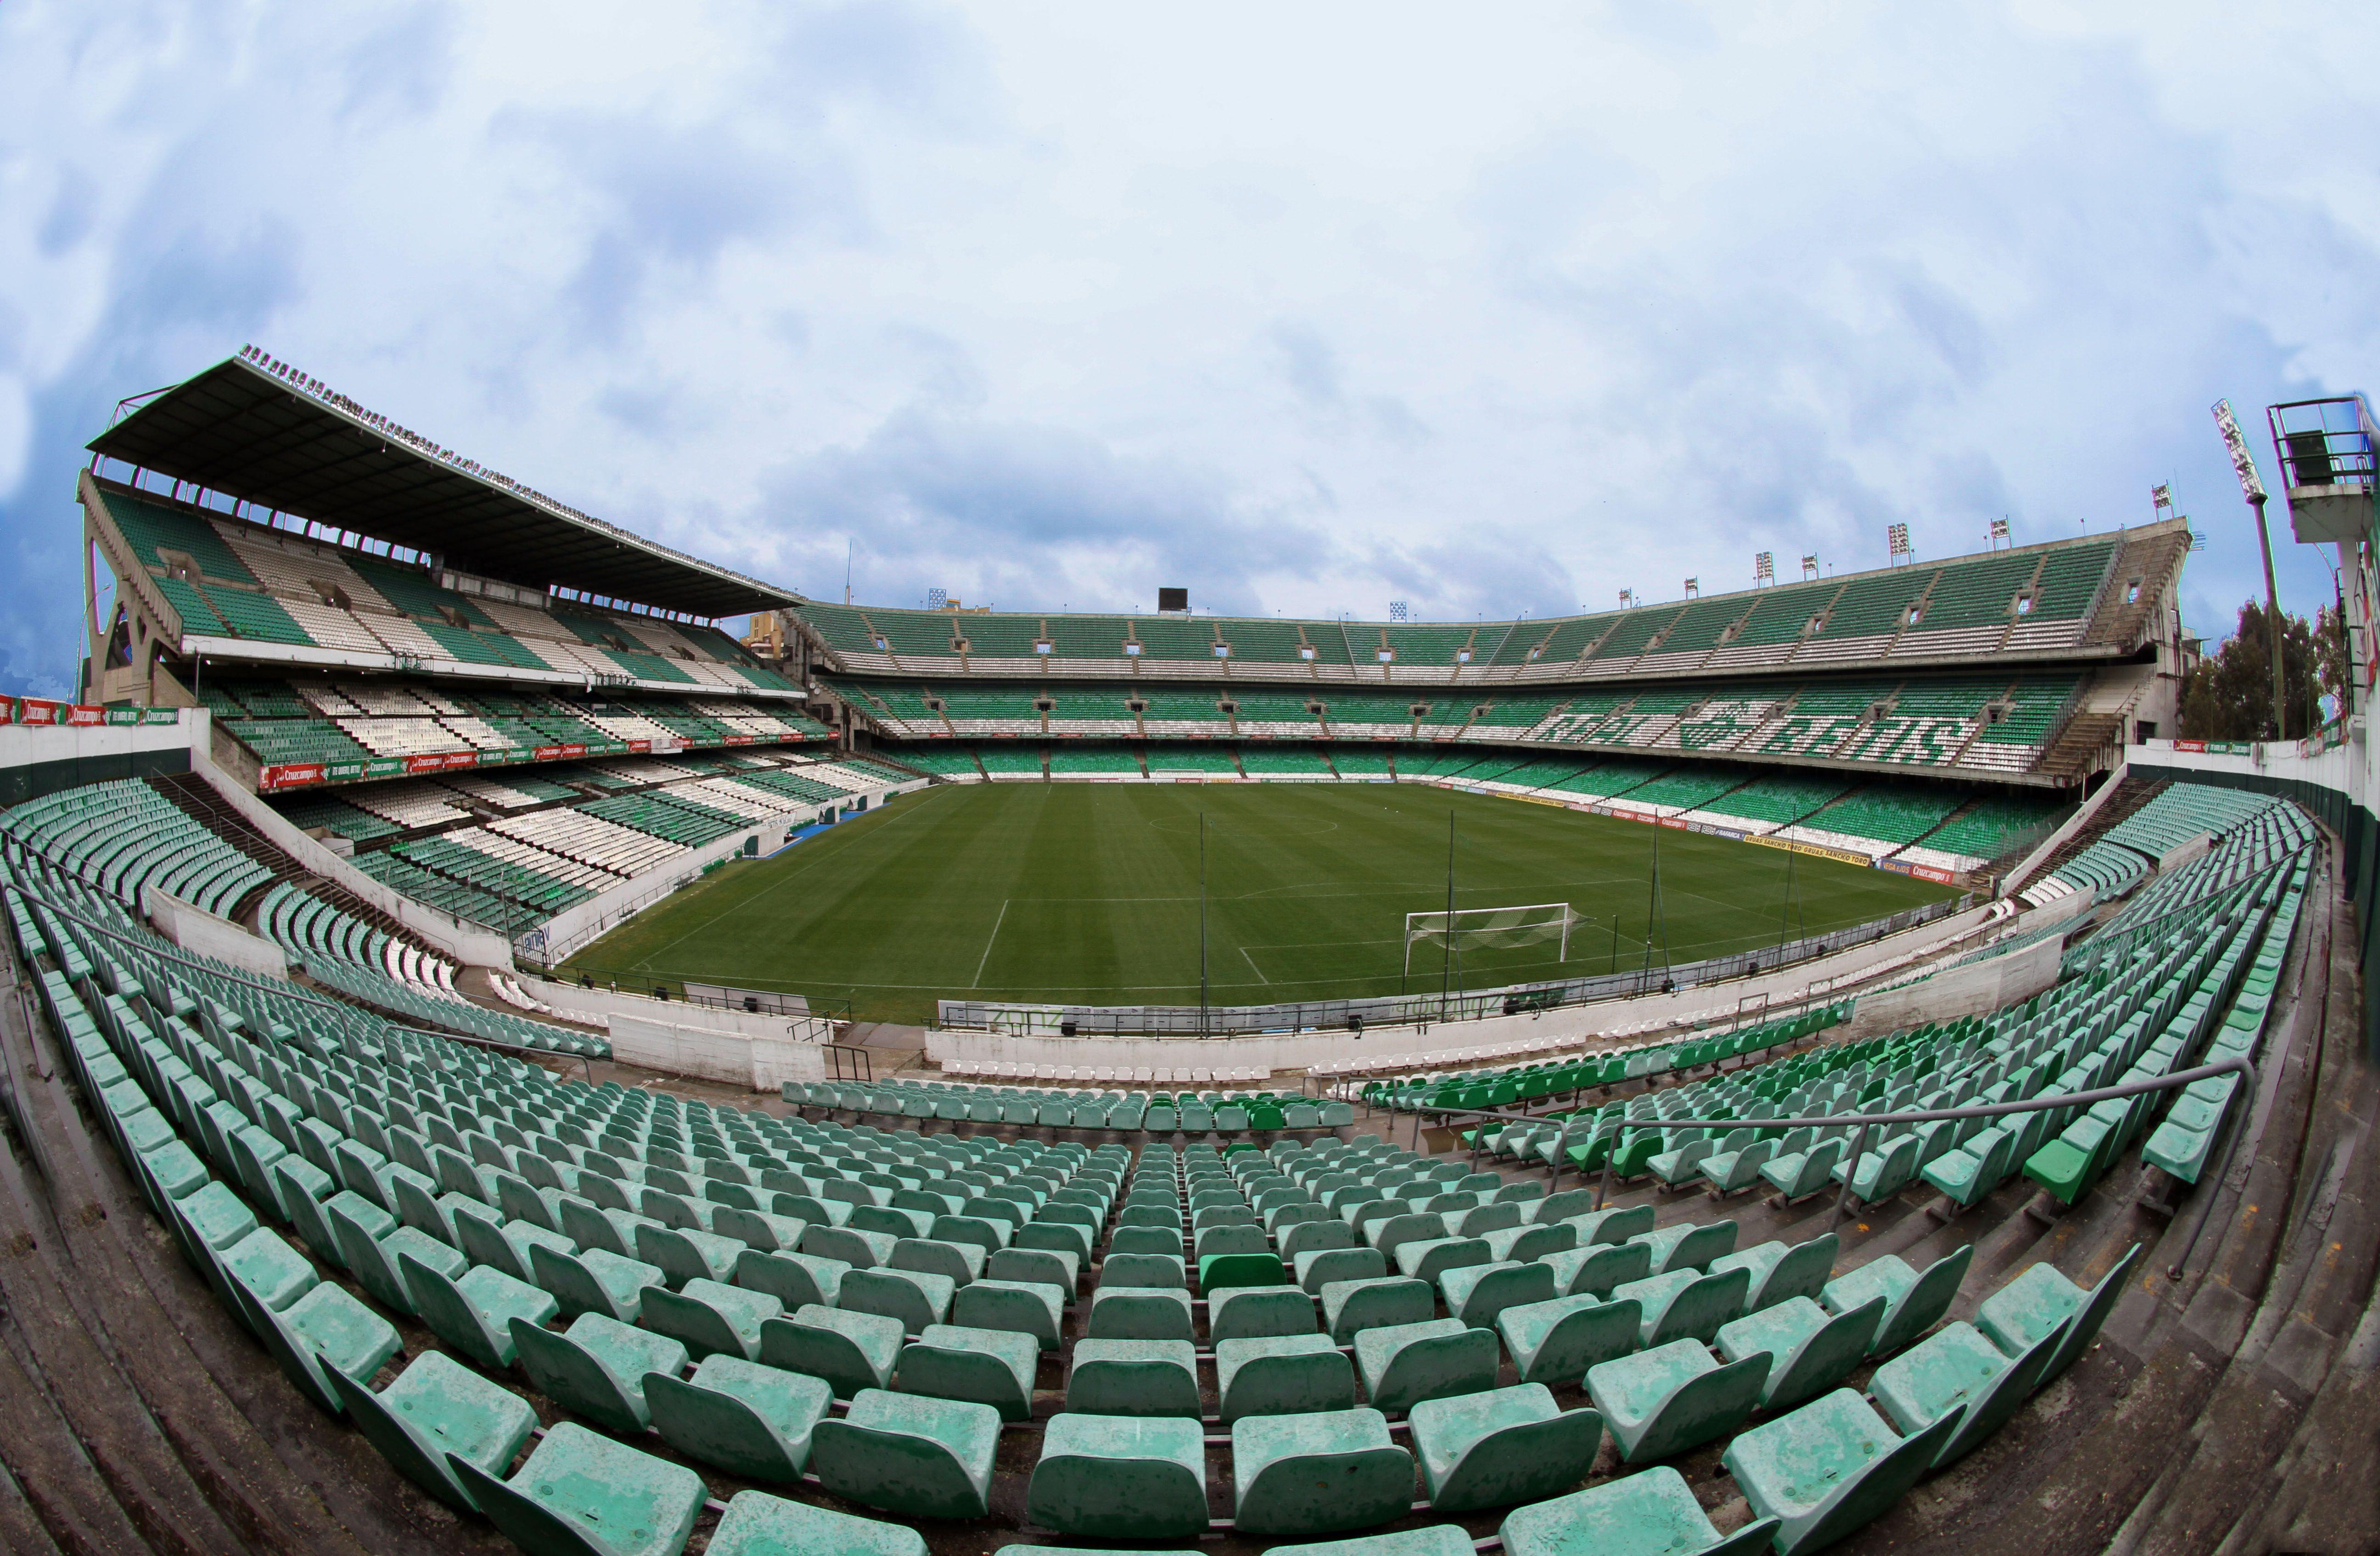 Estadio Benito Villamarín Real Betis Balompie Real Betis Balompié Stadium Wallpaper Football Stadiums